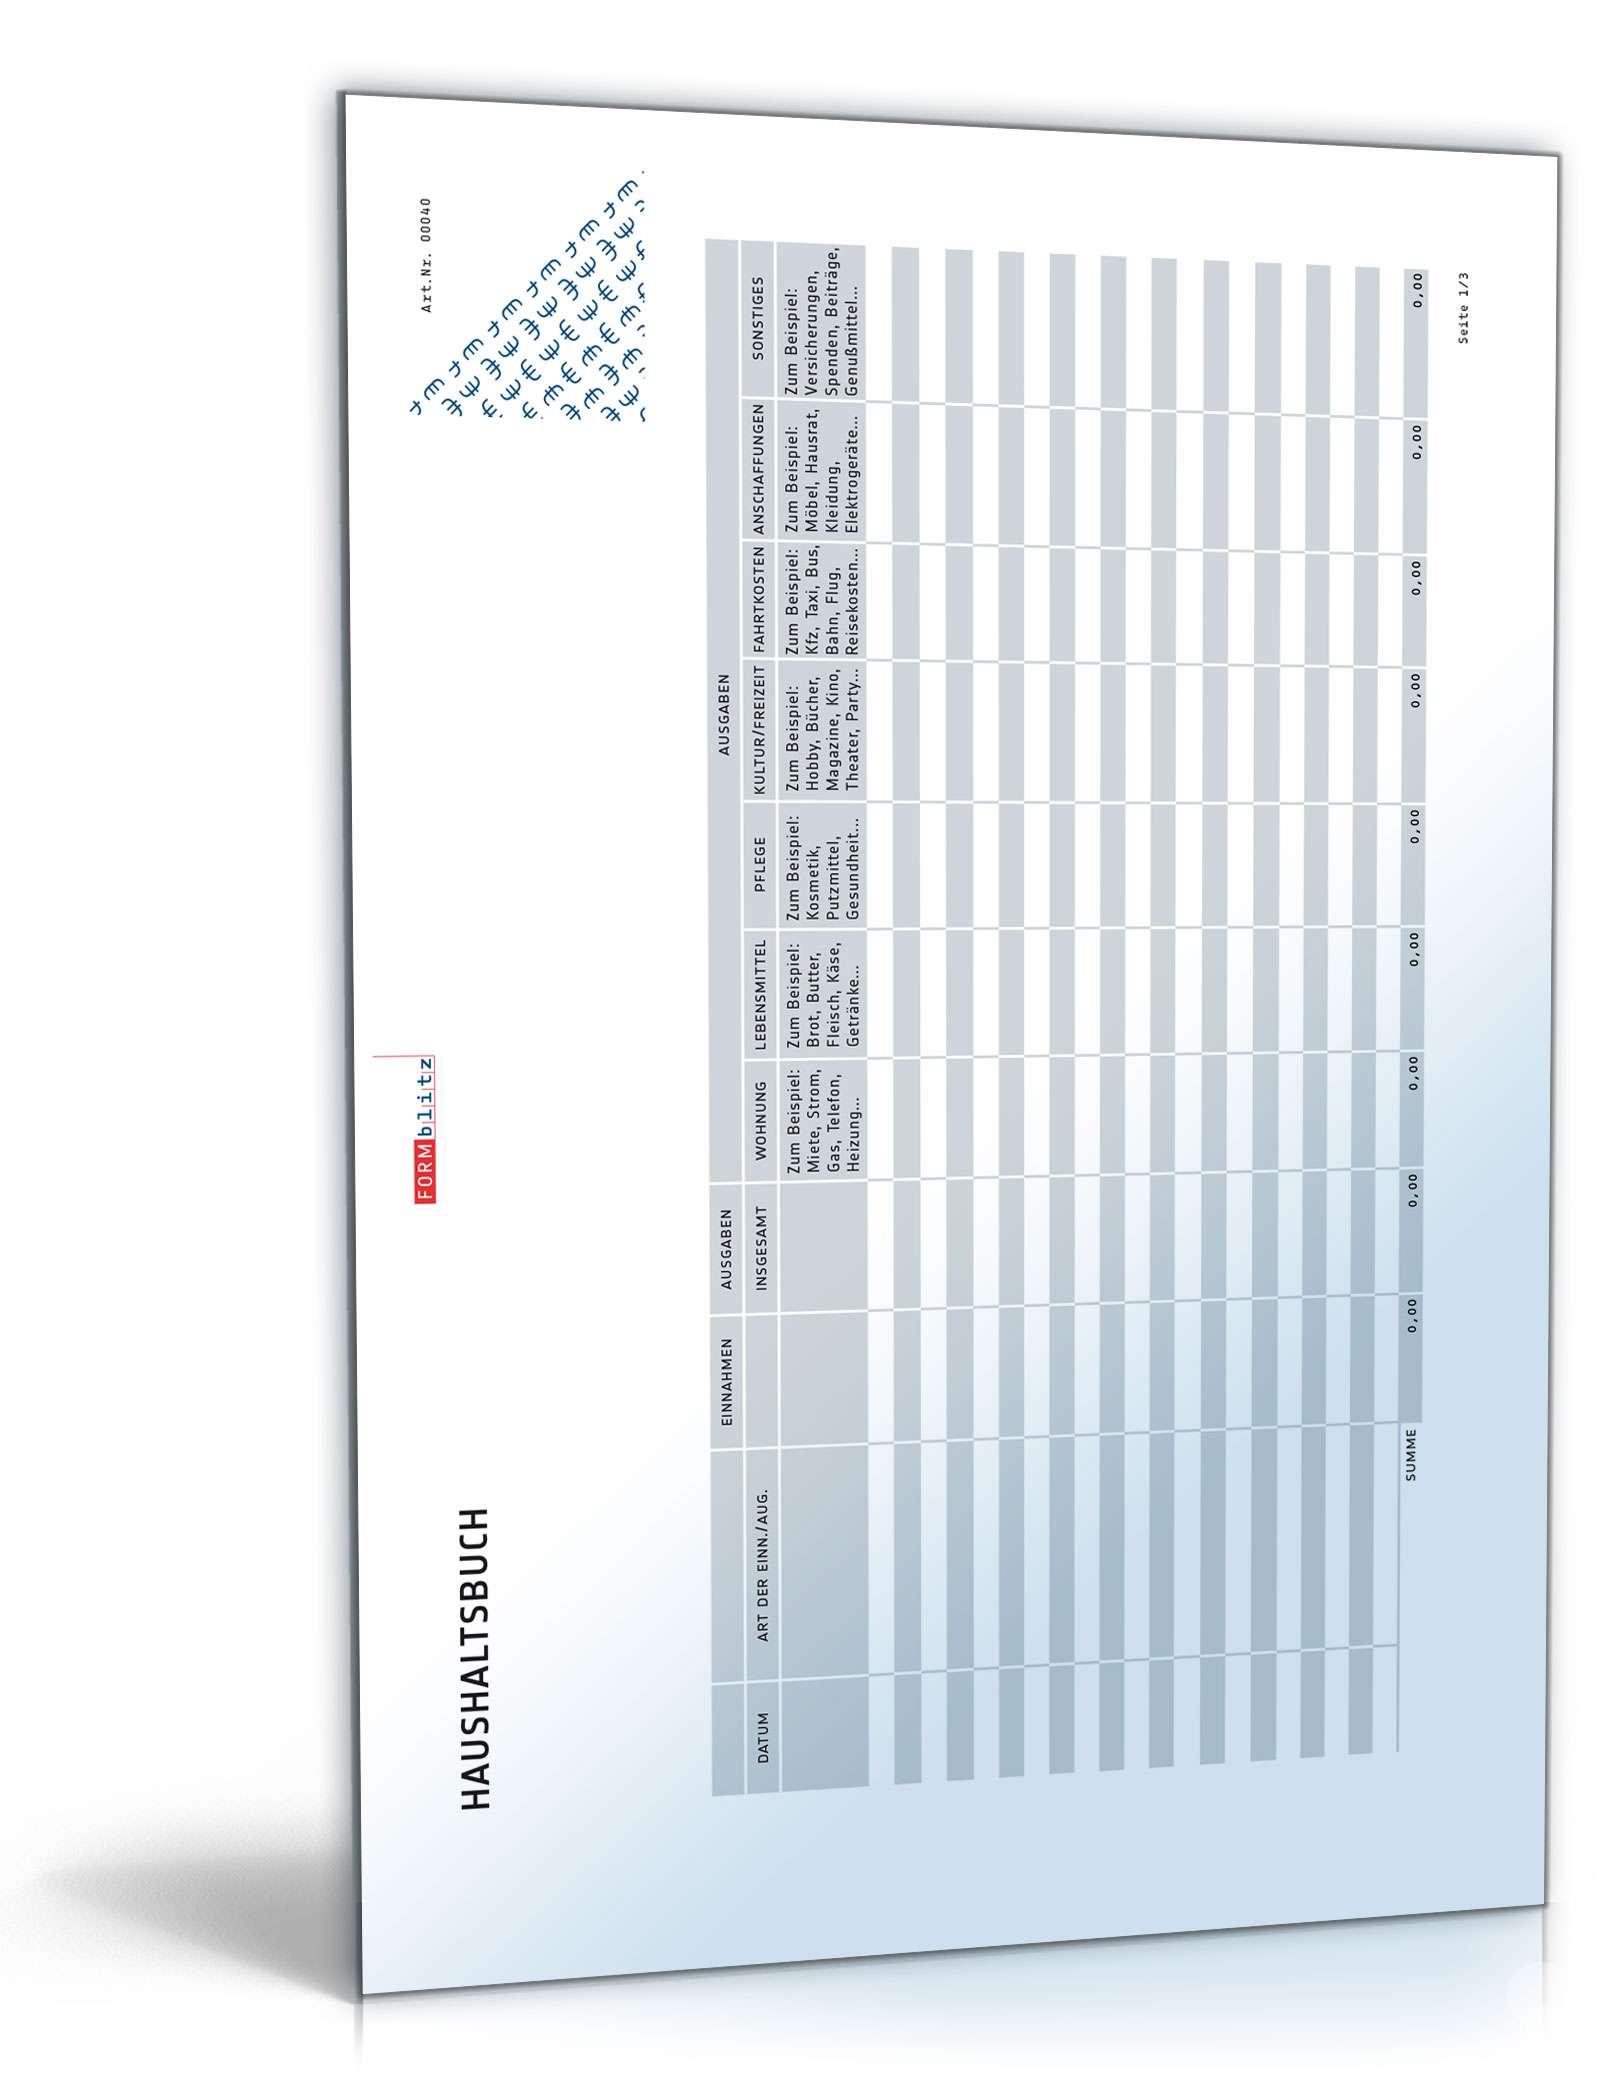 Haushaltsbuch Dokument zum Download